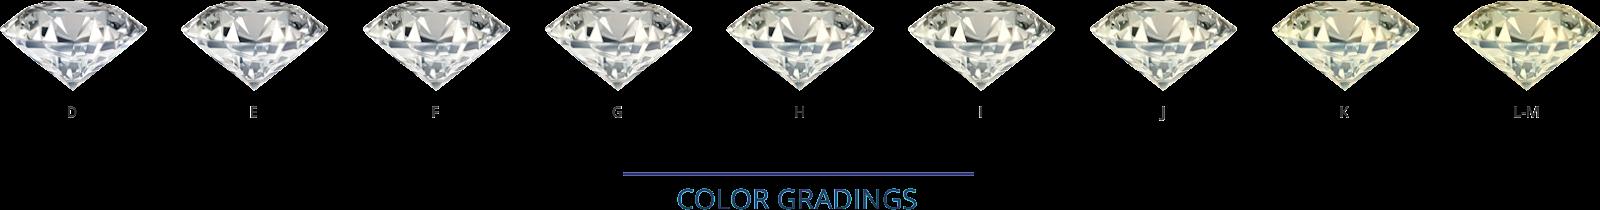 http://randrjewelers.m.gfbeta.net/media/wysiwyg/color_img_1.png